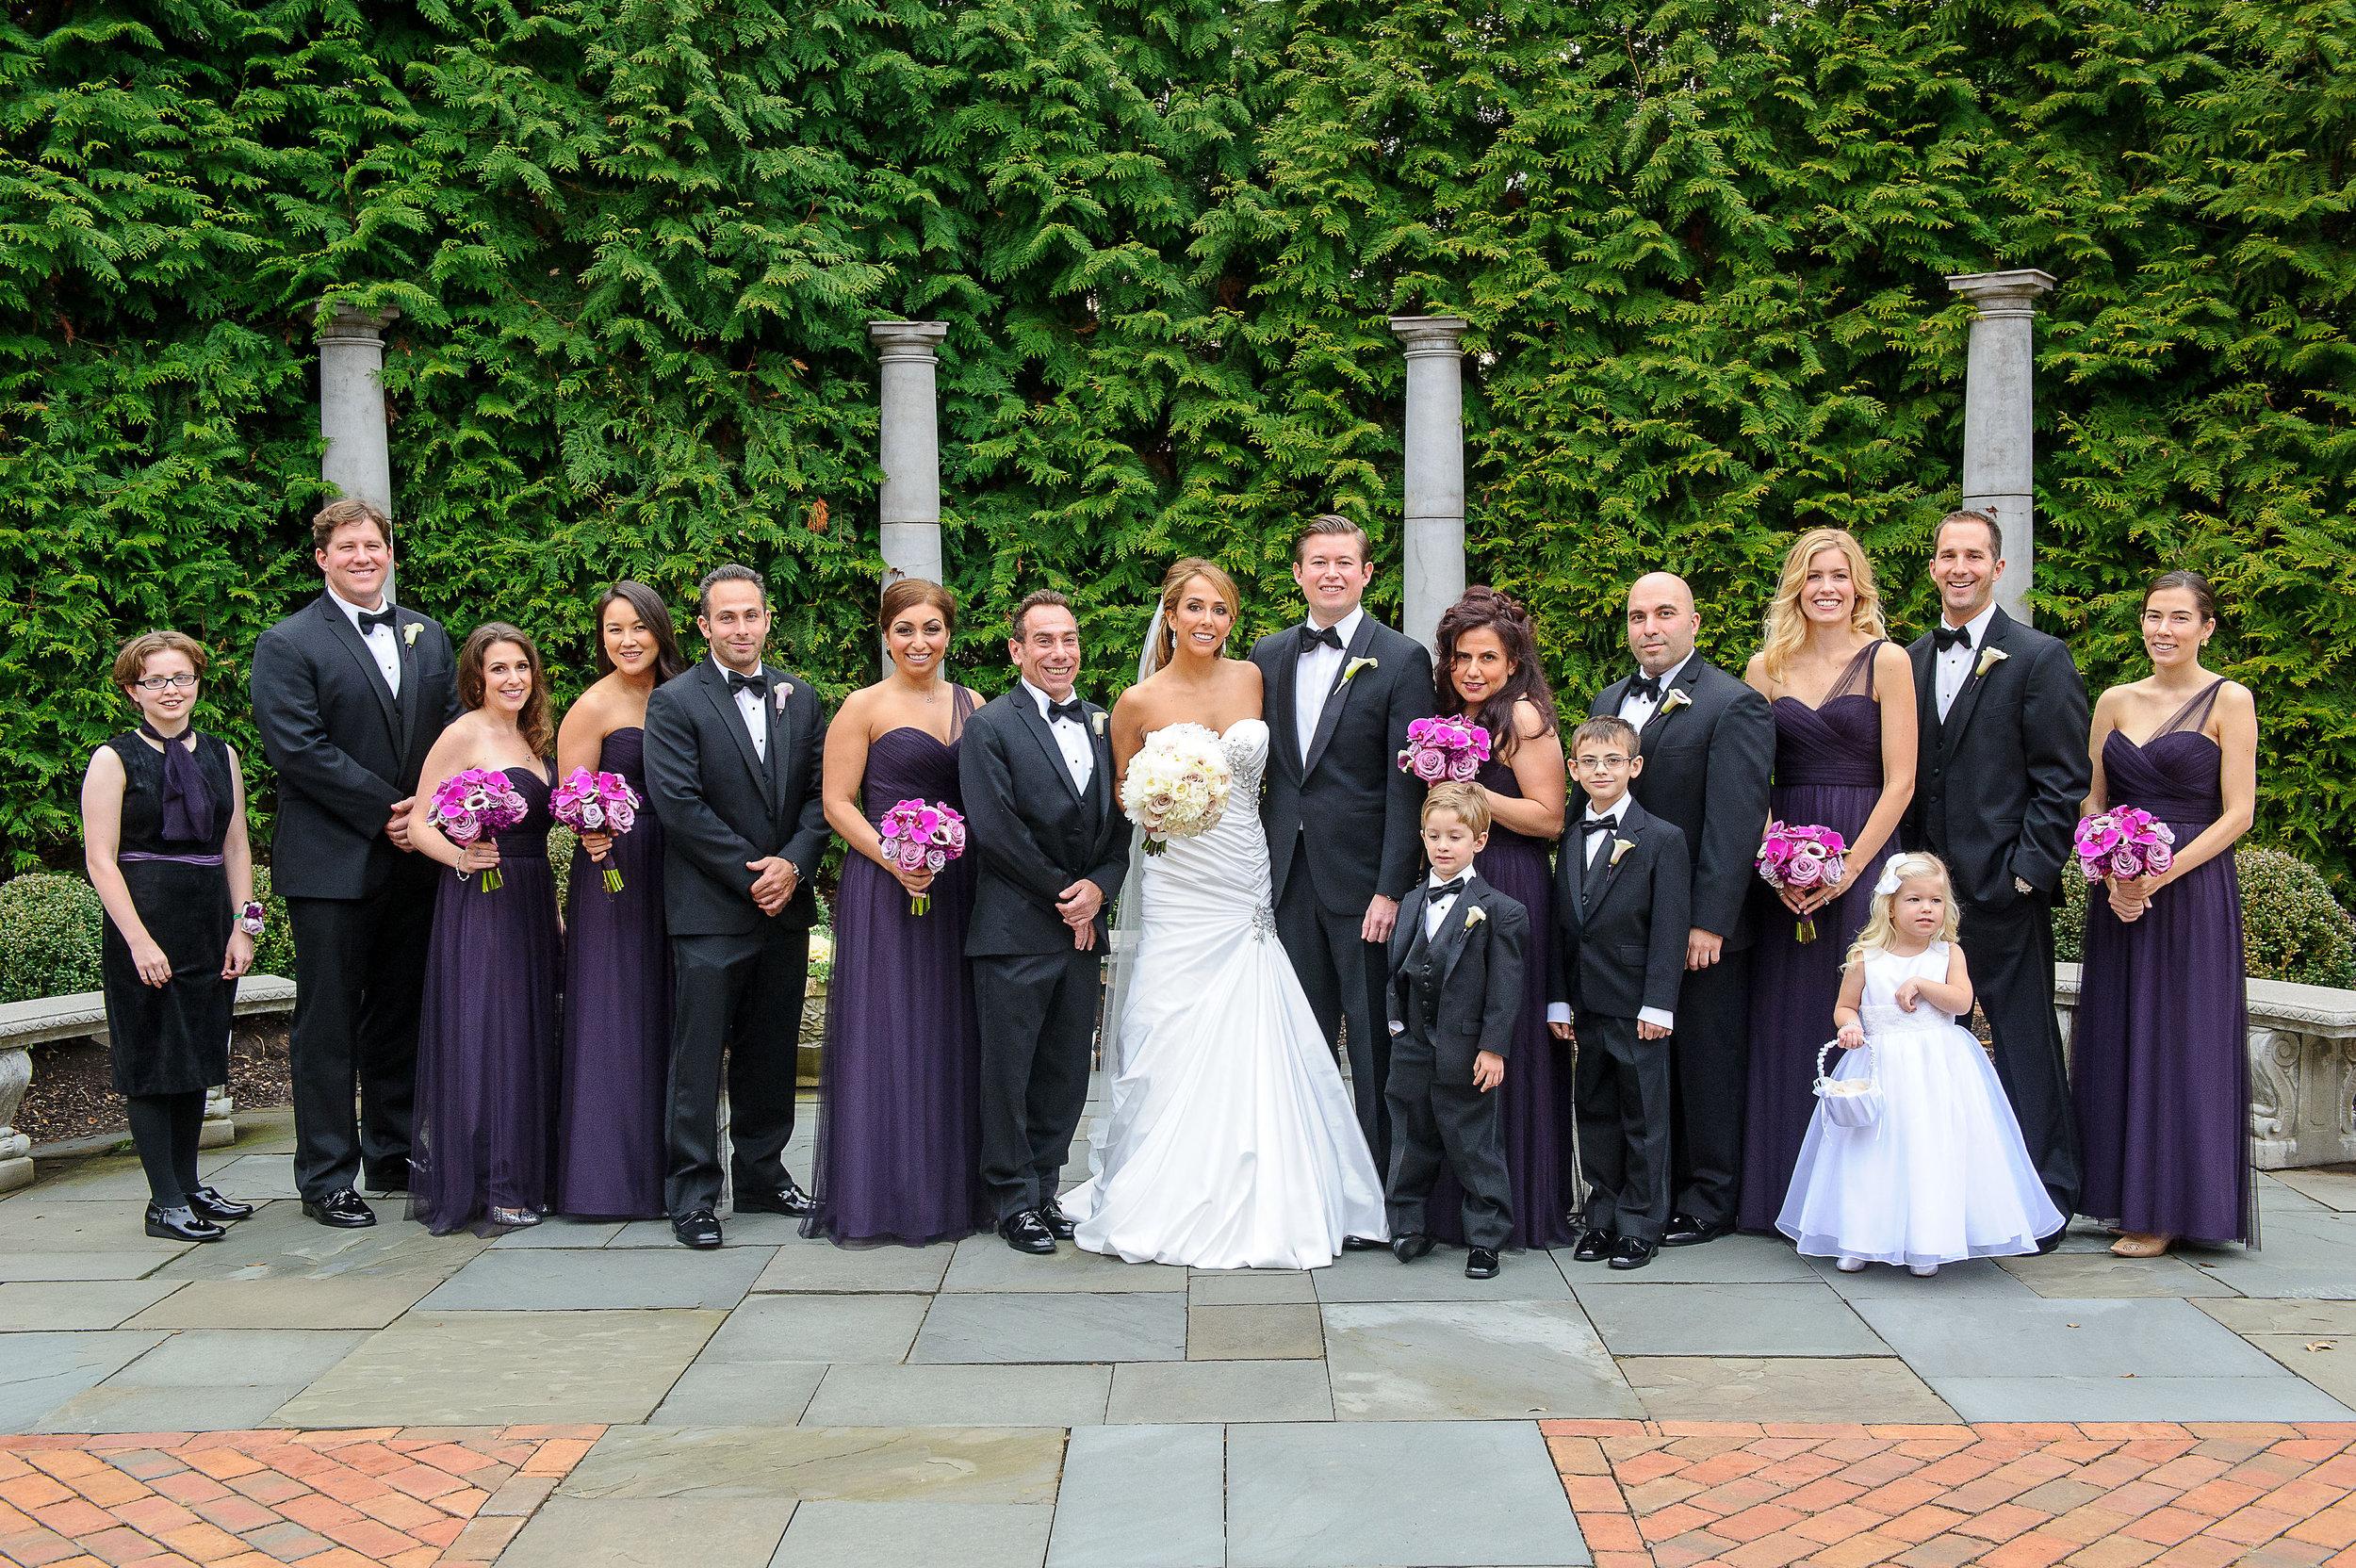 Ceci_New_York_Custom_Invitation_ New_Jersey_Wedding_Luxury_Personalized_Ceci_Style_Bride_Foil_Stamping97.JPG